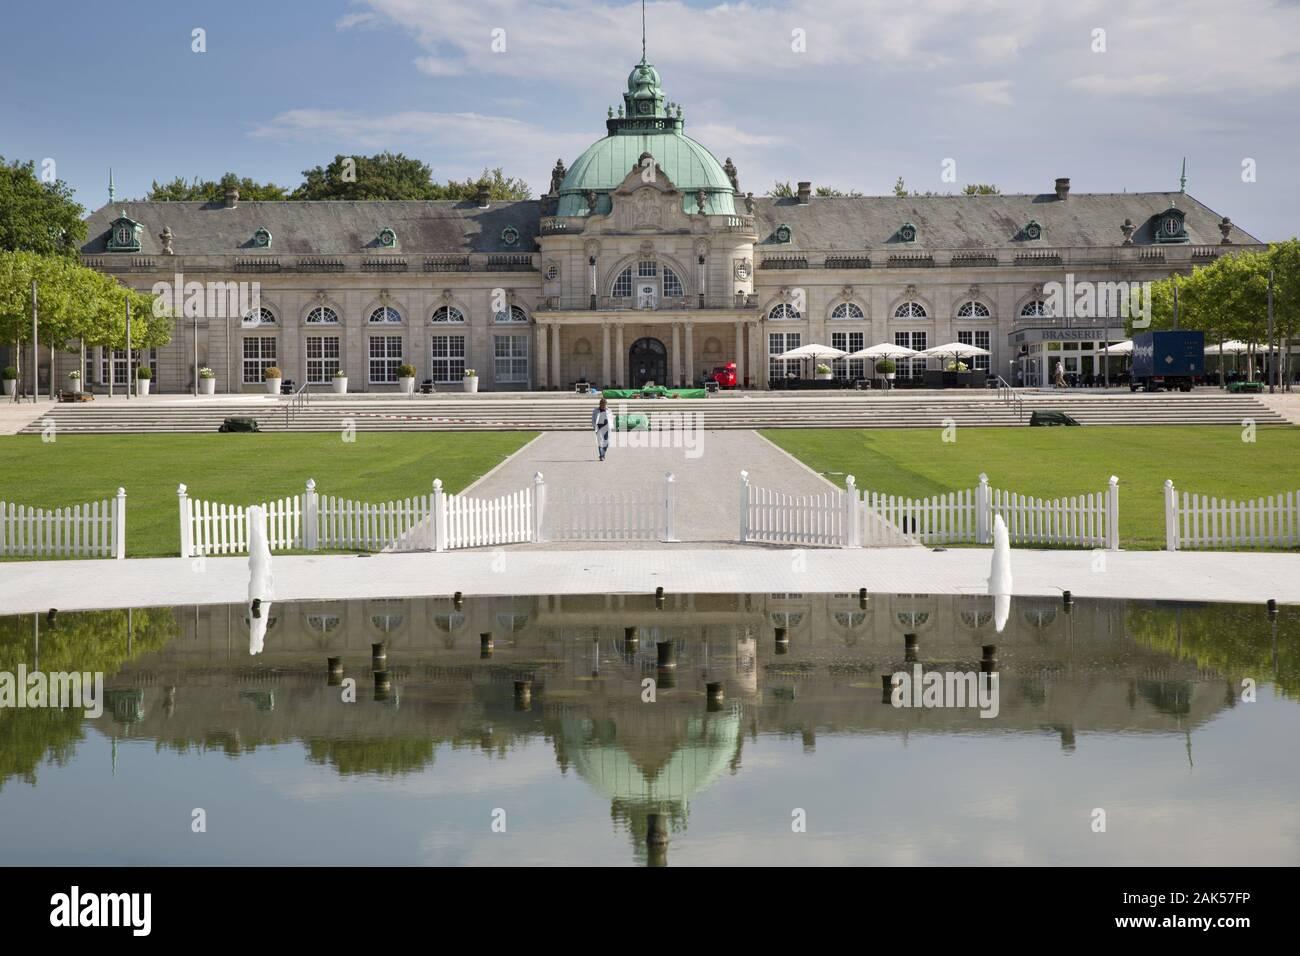 Bad Oeyenhausen: Blick auf das Kaiserpalais, Weserbergland | usage worldwide Stock Photo